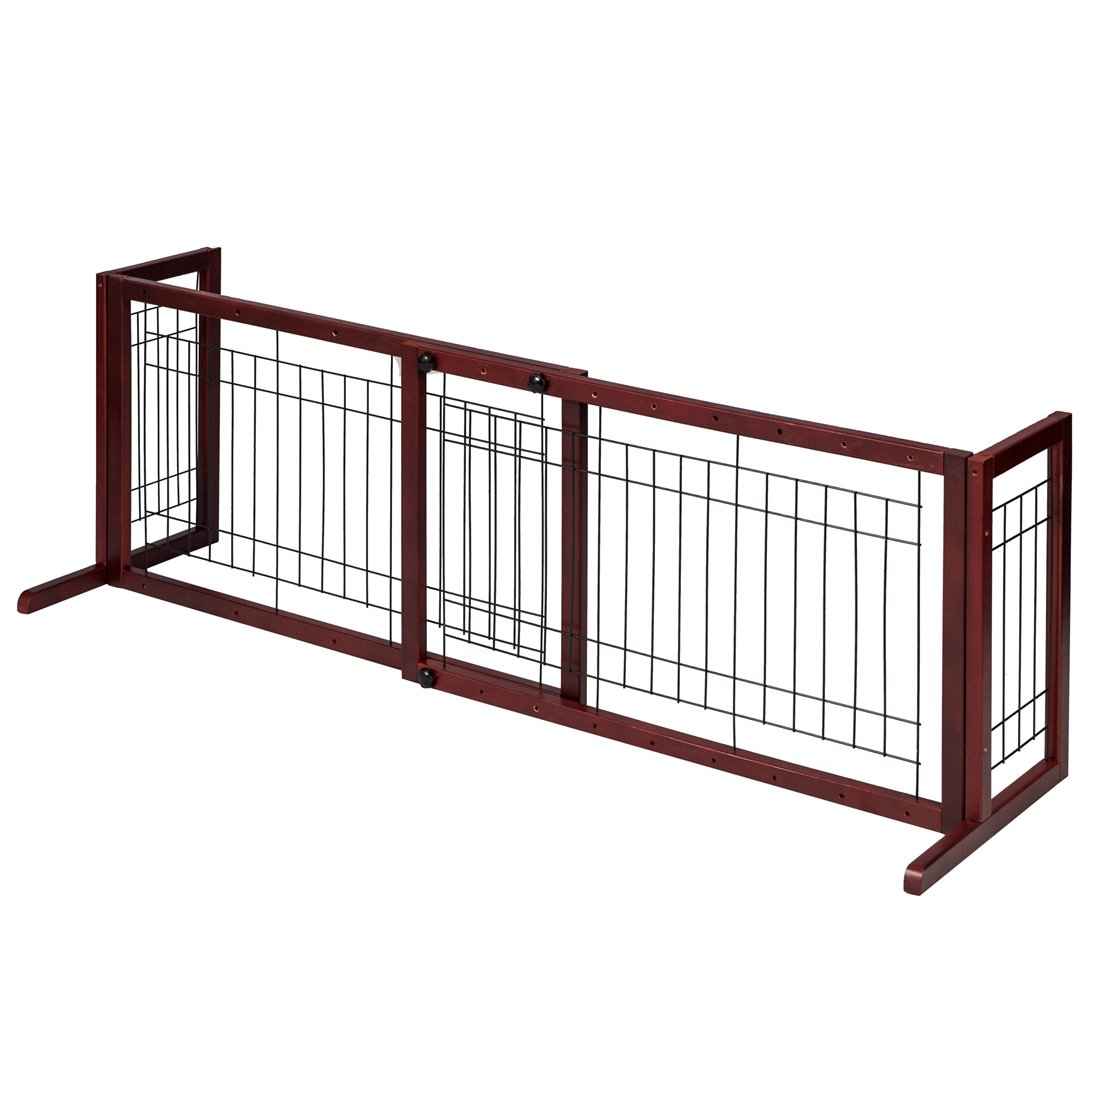 GOOD LIFE Wooden Fence Freestanding Pet Dog Gate Indoor Adjustable Gates for Home Coffee Color 72 Inch PET344